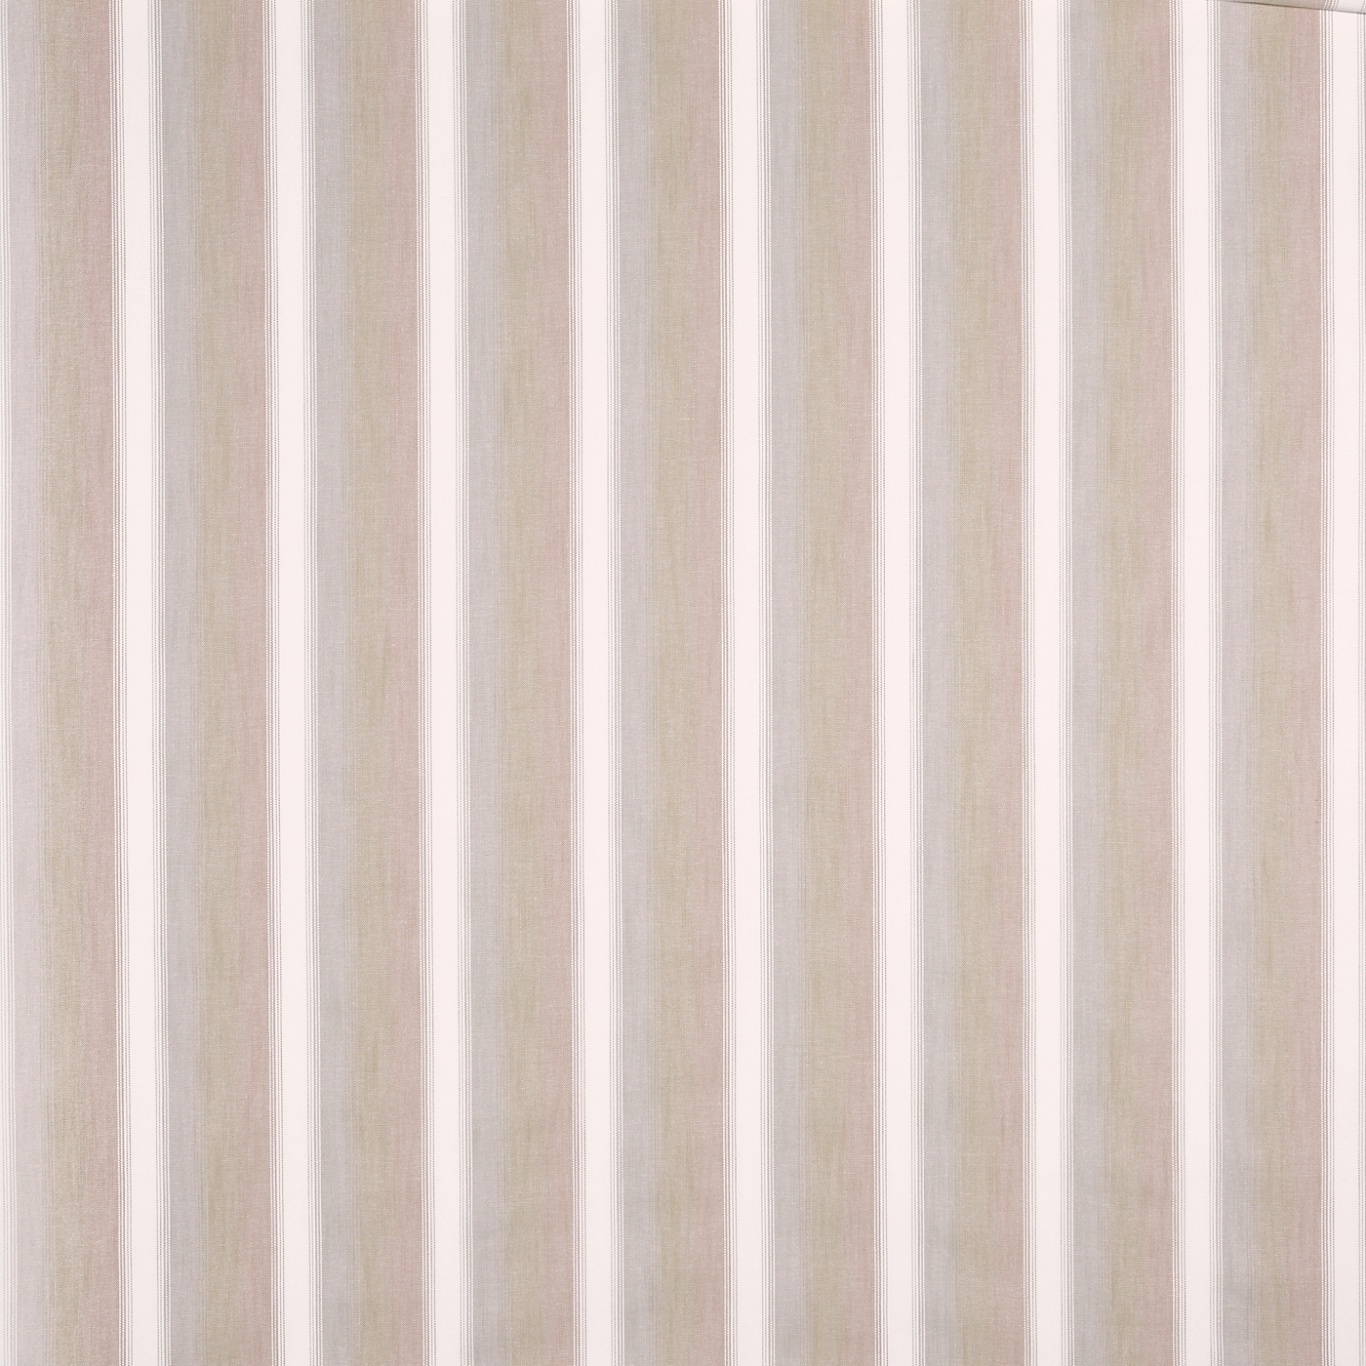 Image of Prestigious Harpenden Petal Fabric 3760/213